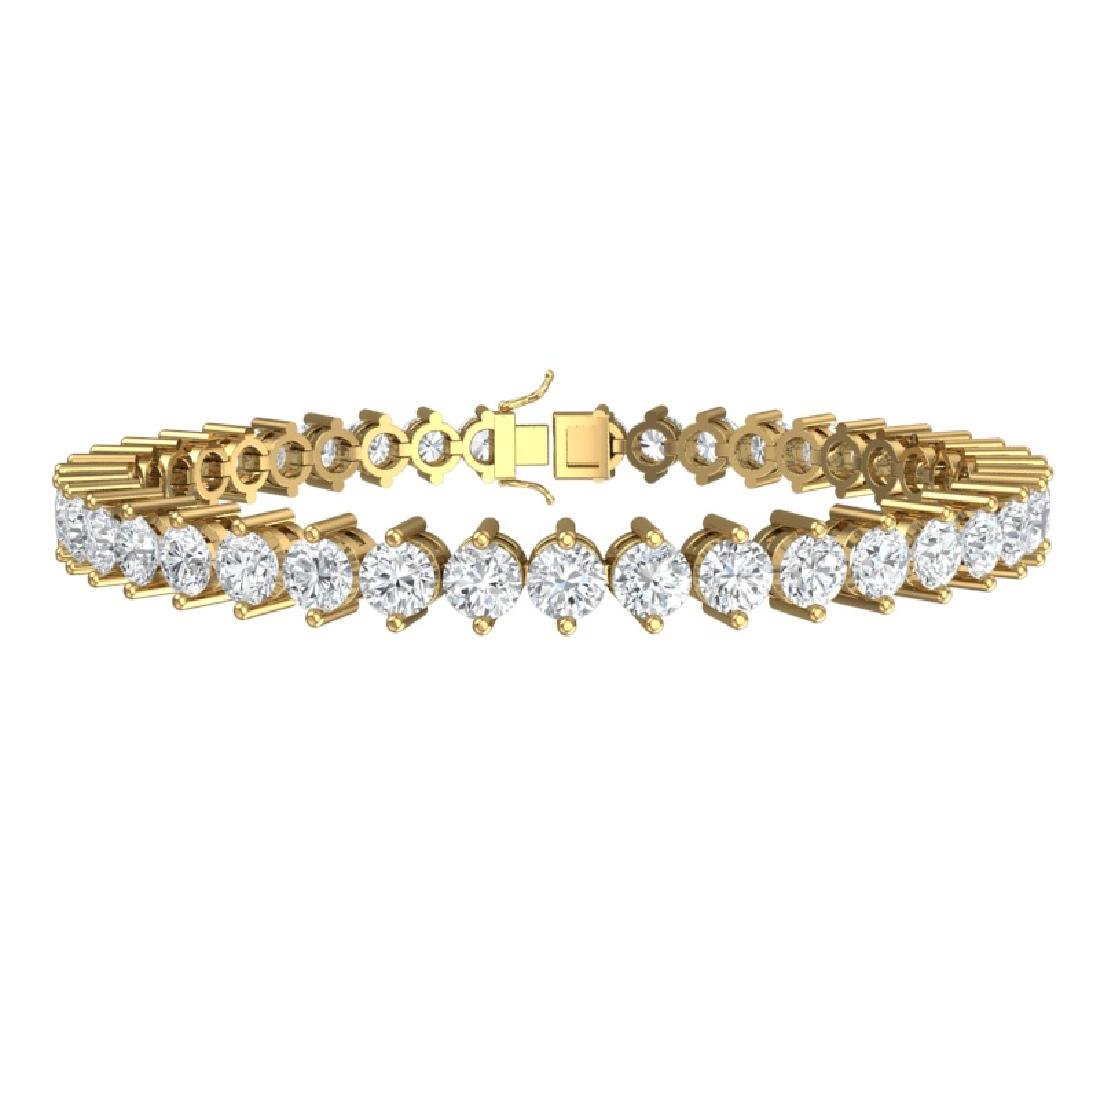 13 CTW Certified VS/SI Diamond Bracelet 18K Yellow Gold - 3